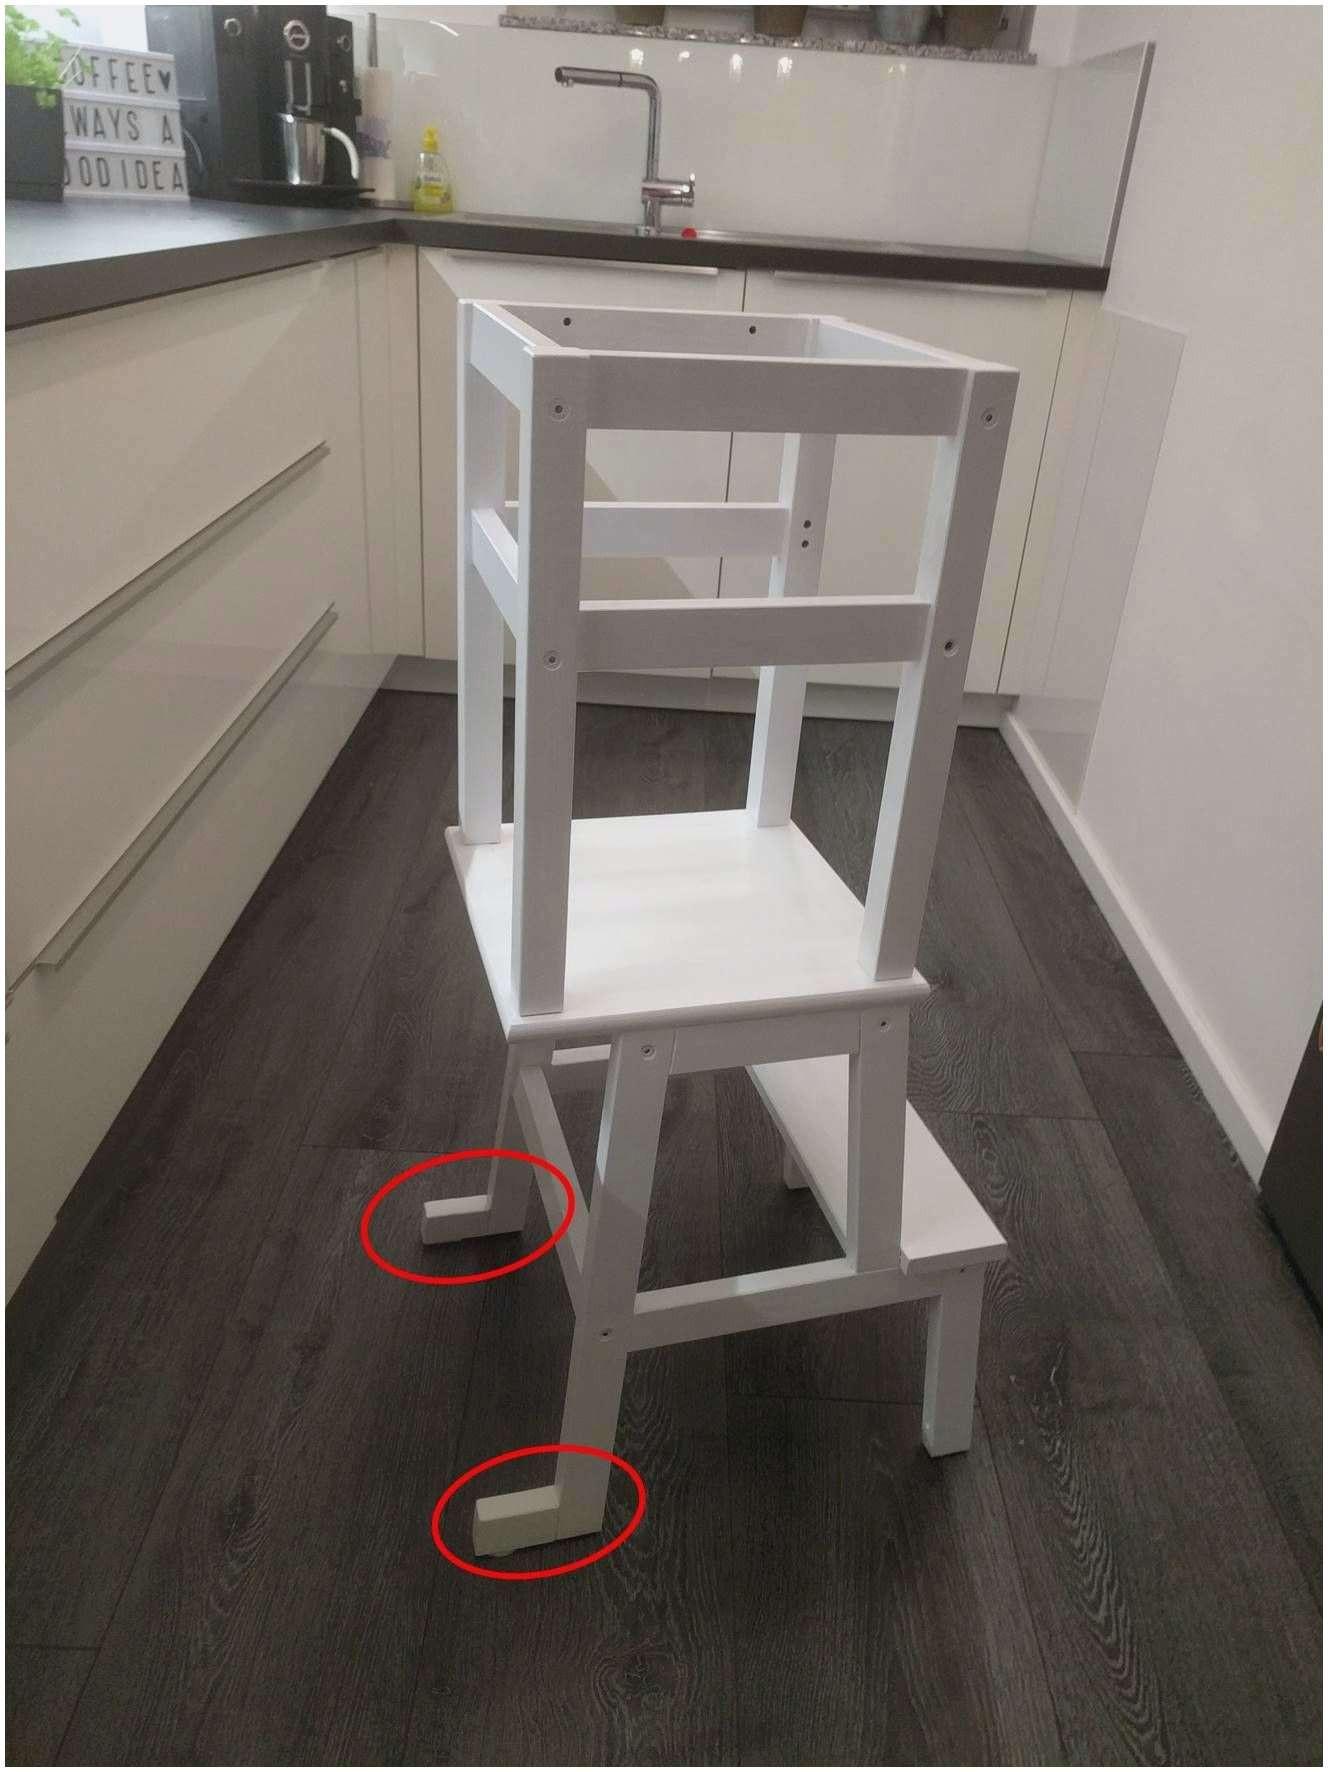 meuble rangement design meuble rangement bois 86 idees de design meuble blanc rangement of meuble rangement design